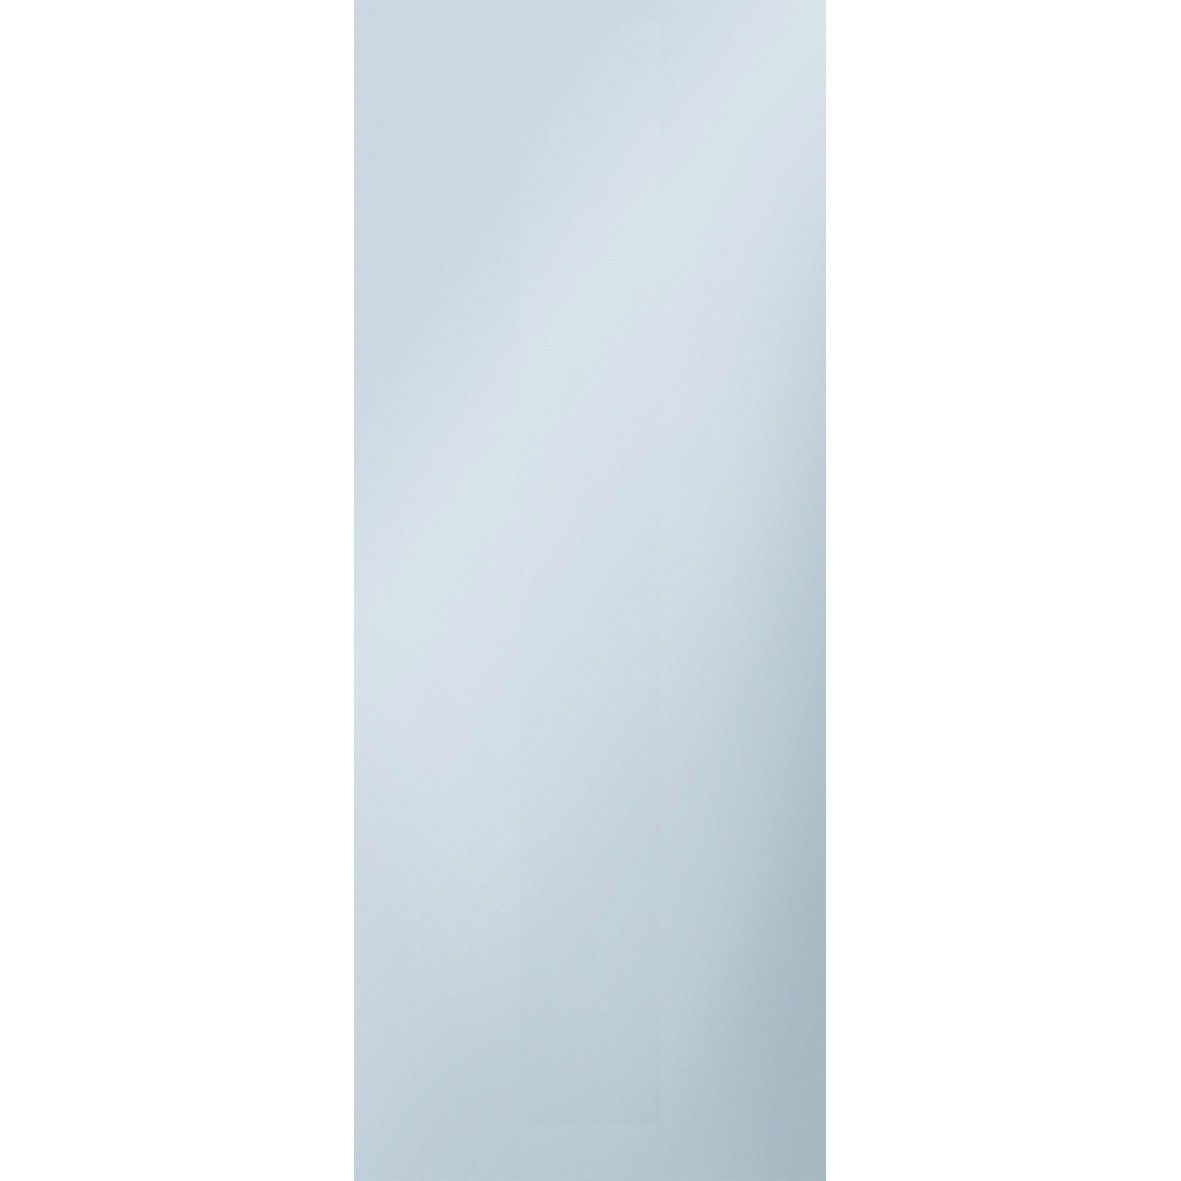 Porte coulissante verre tremp translucide eclisse 211 x - Porte coulissante verre leroy merlin ...